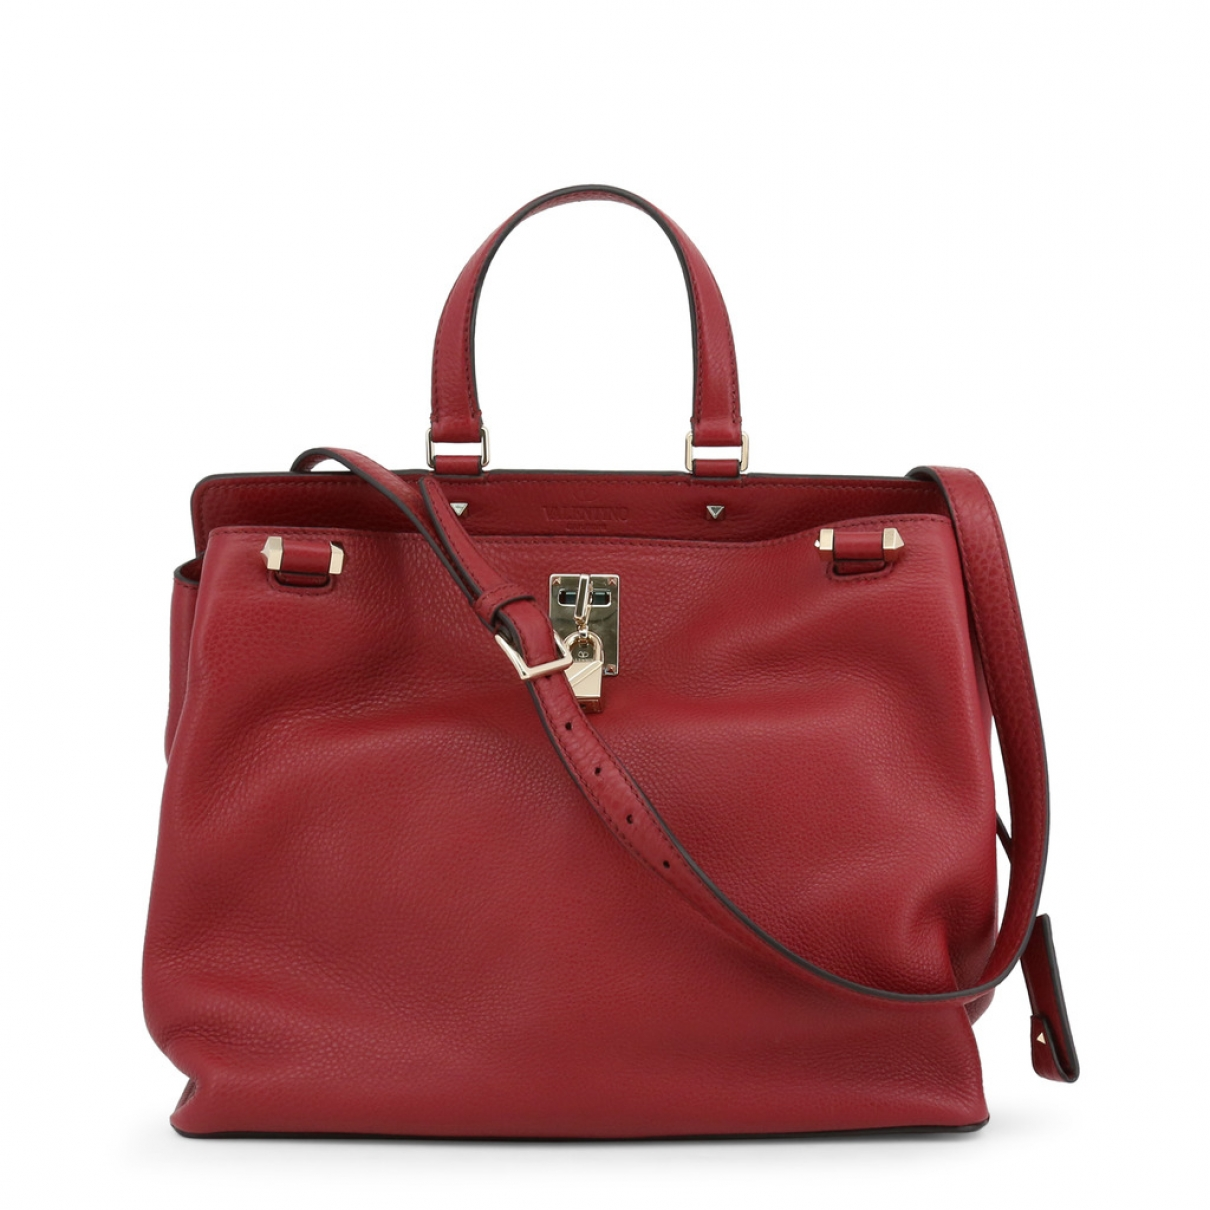 Valentino Garavani JoyLock Red Leather handbag for Women \N